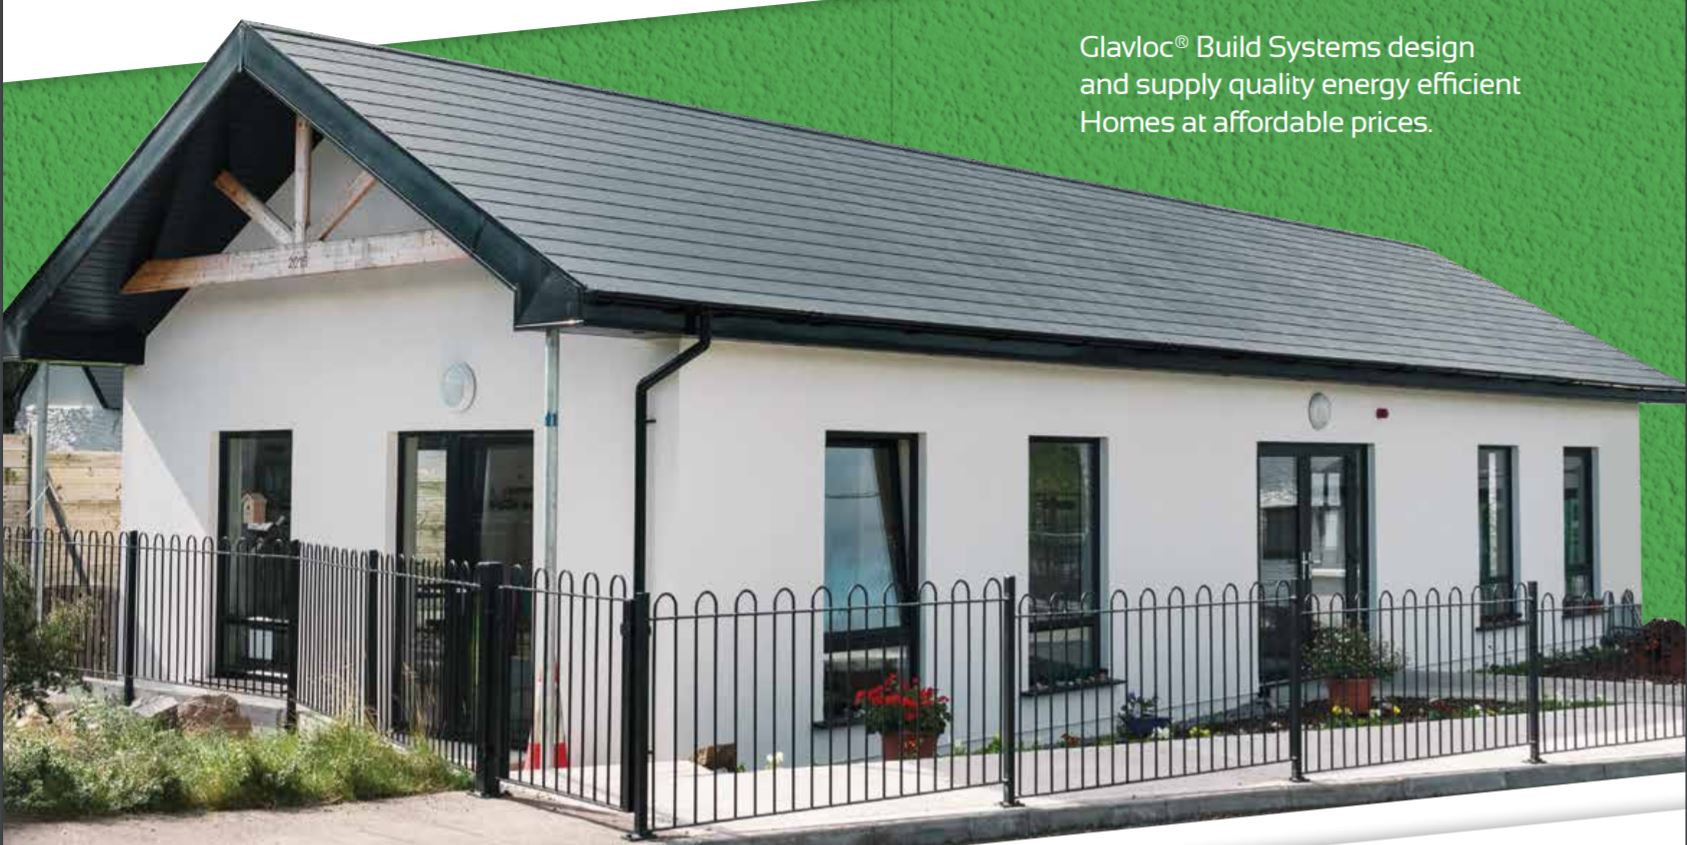 Glavloc® Homes